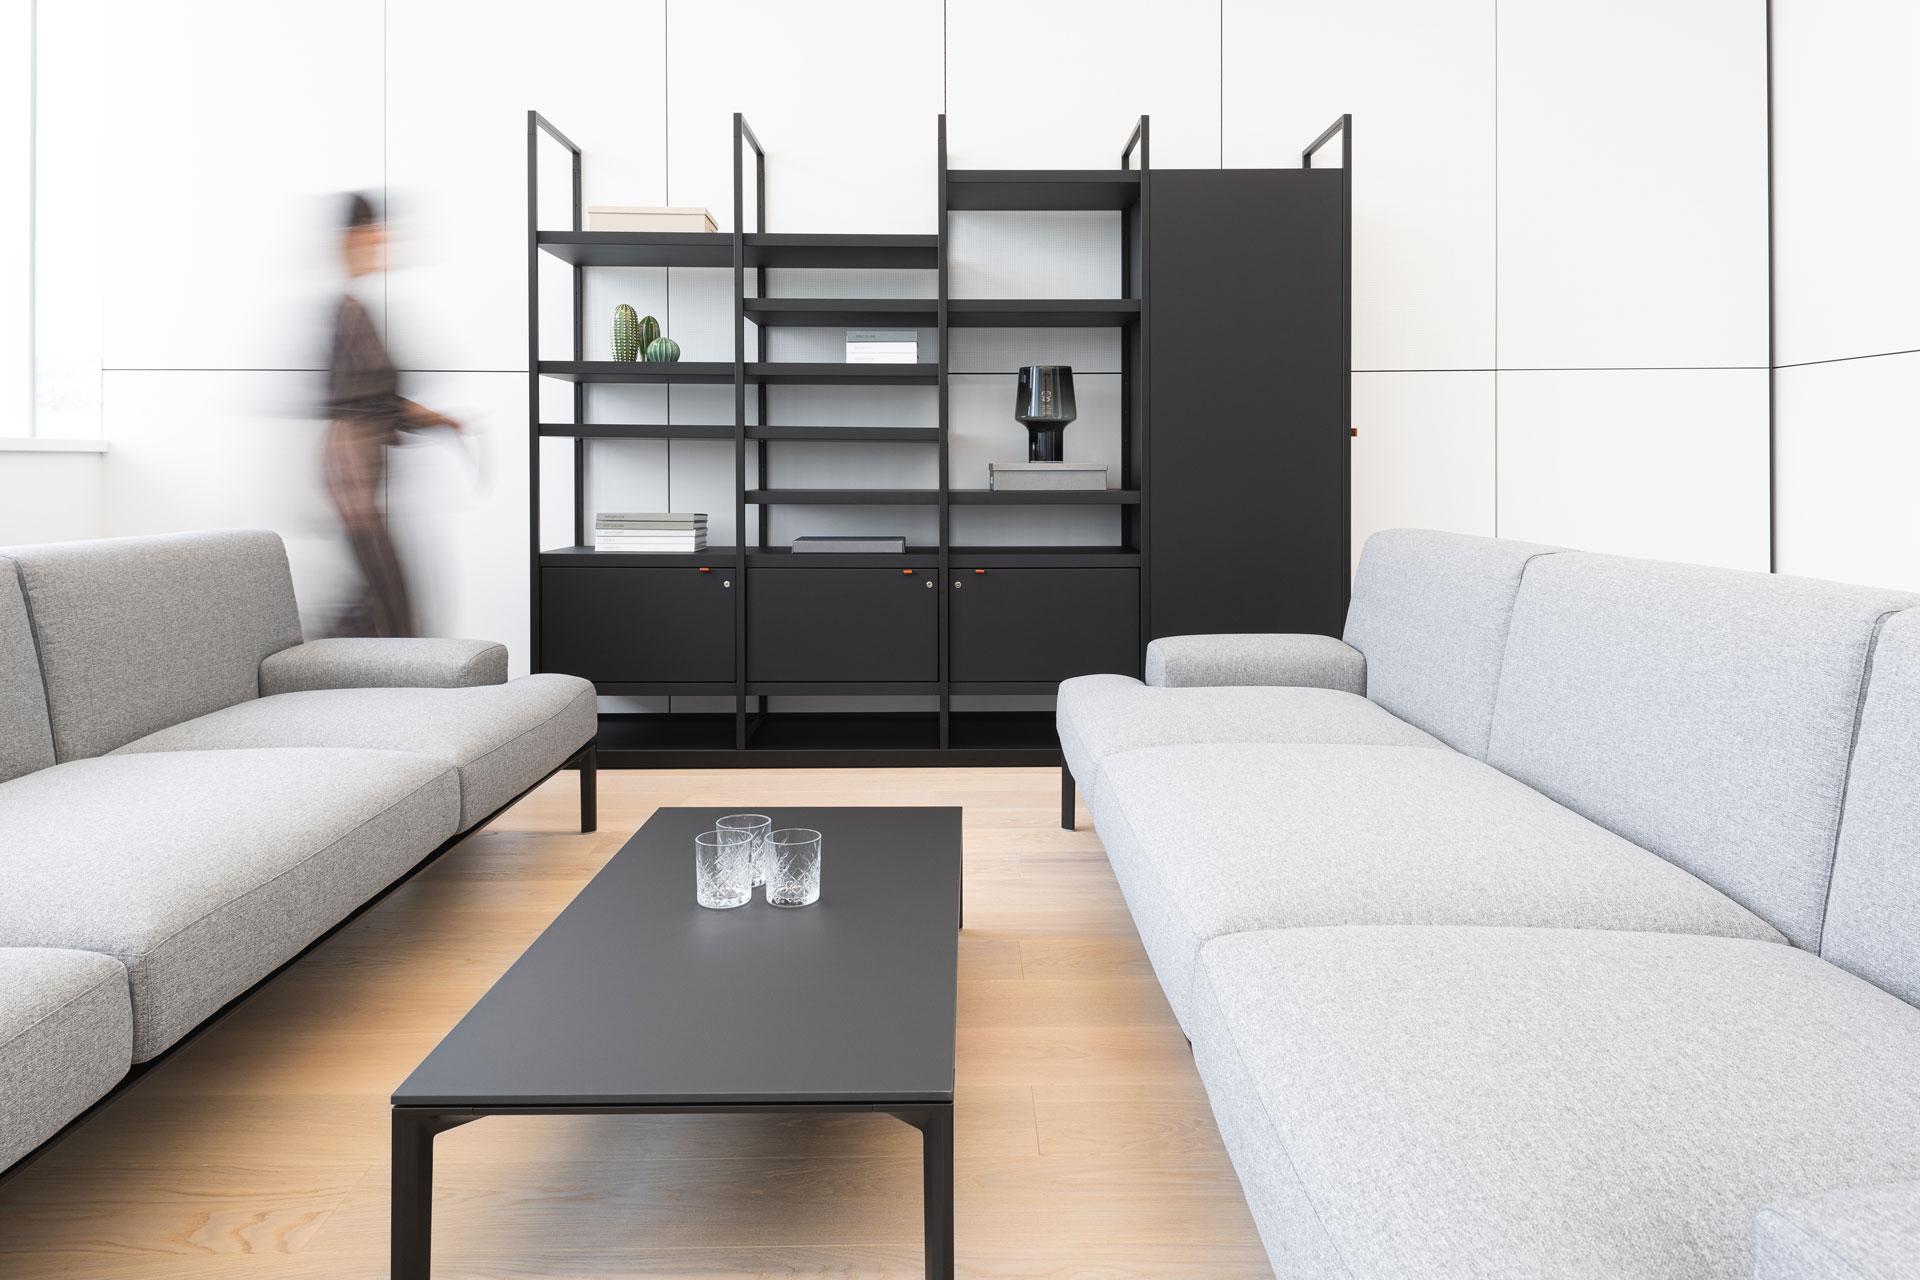 Ringana, interior design, design, innenarchitektur, office design, möbel, designed von studio thörnblom